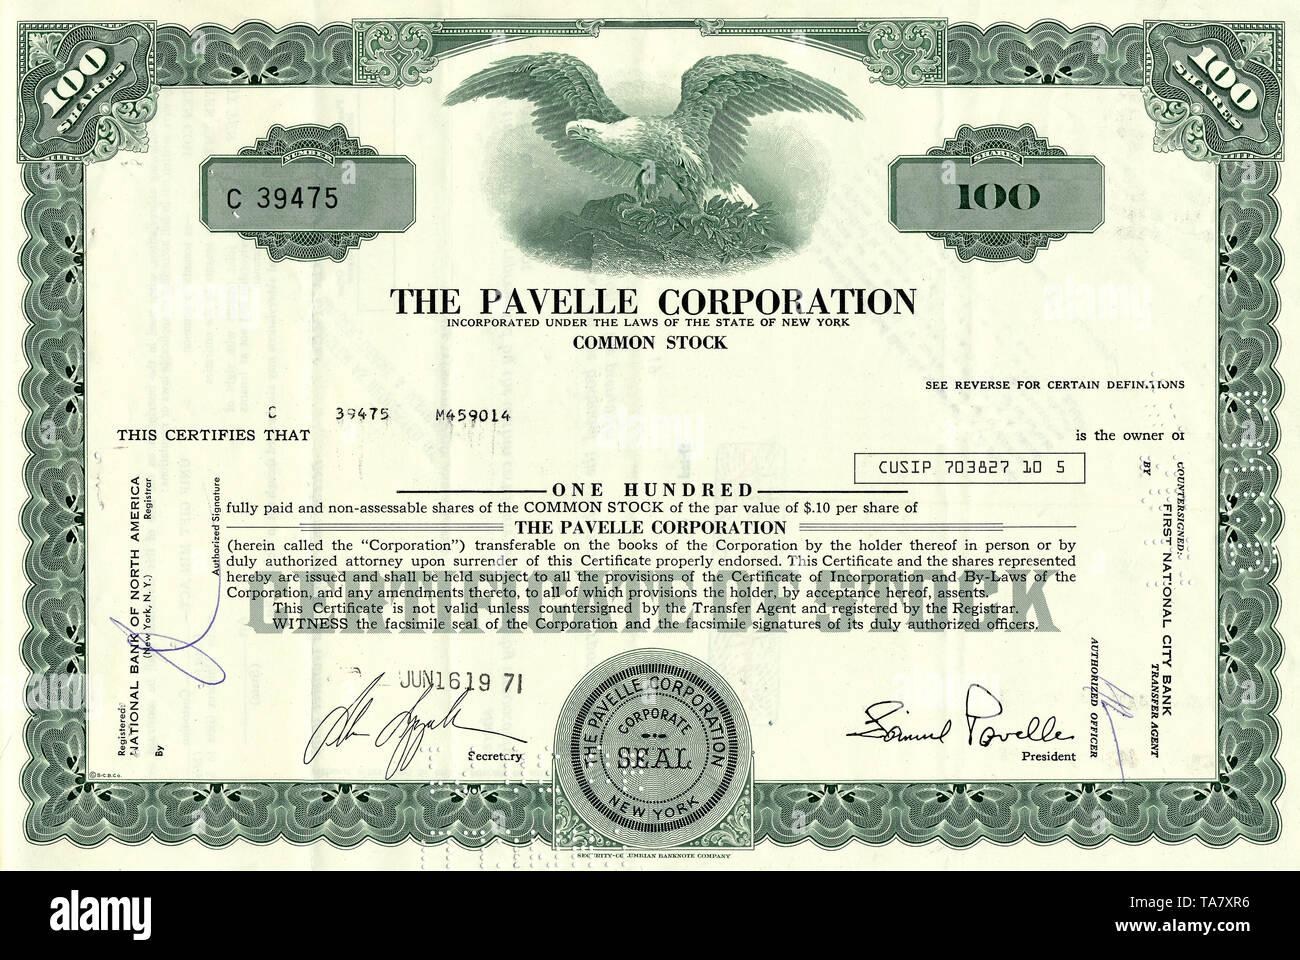 Historische Aktie, Foto, Chemie, Pavelle Corporation, 1971, New York, USA, Historical stock certificate - Stock Image